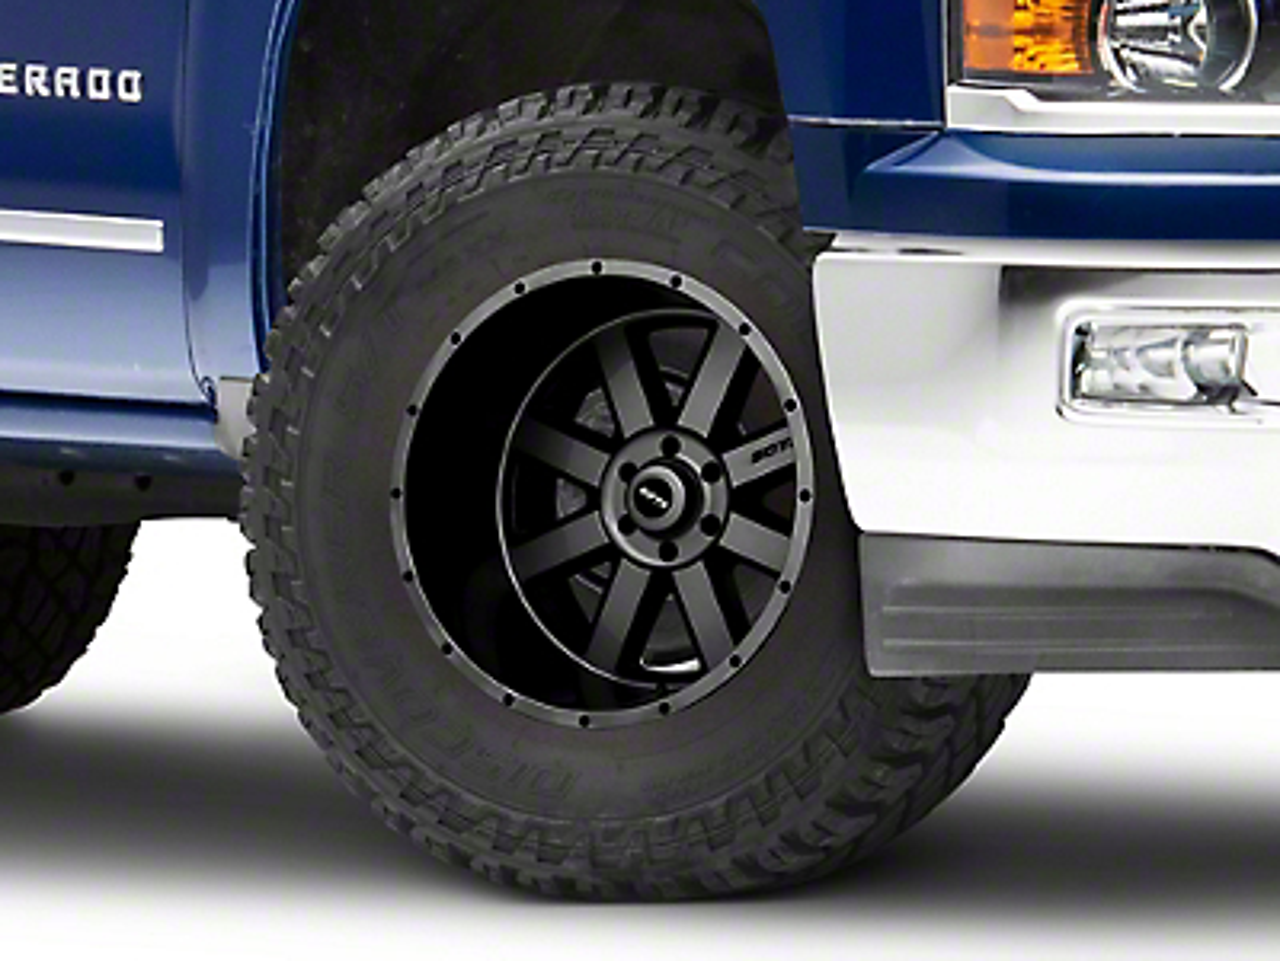 SOTA Off Road AWOL Anthra-Kote Black 6-Lug Wheel - 22x12 (07-18 Silverado 1500)